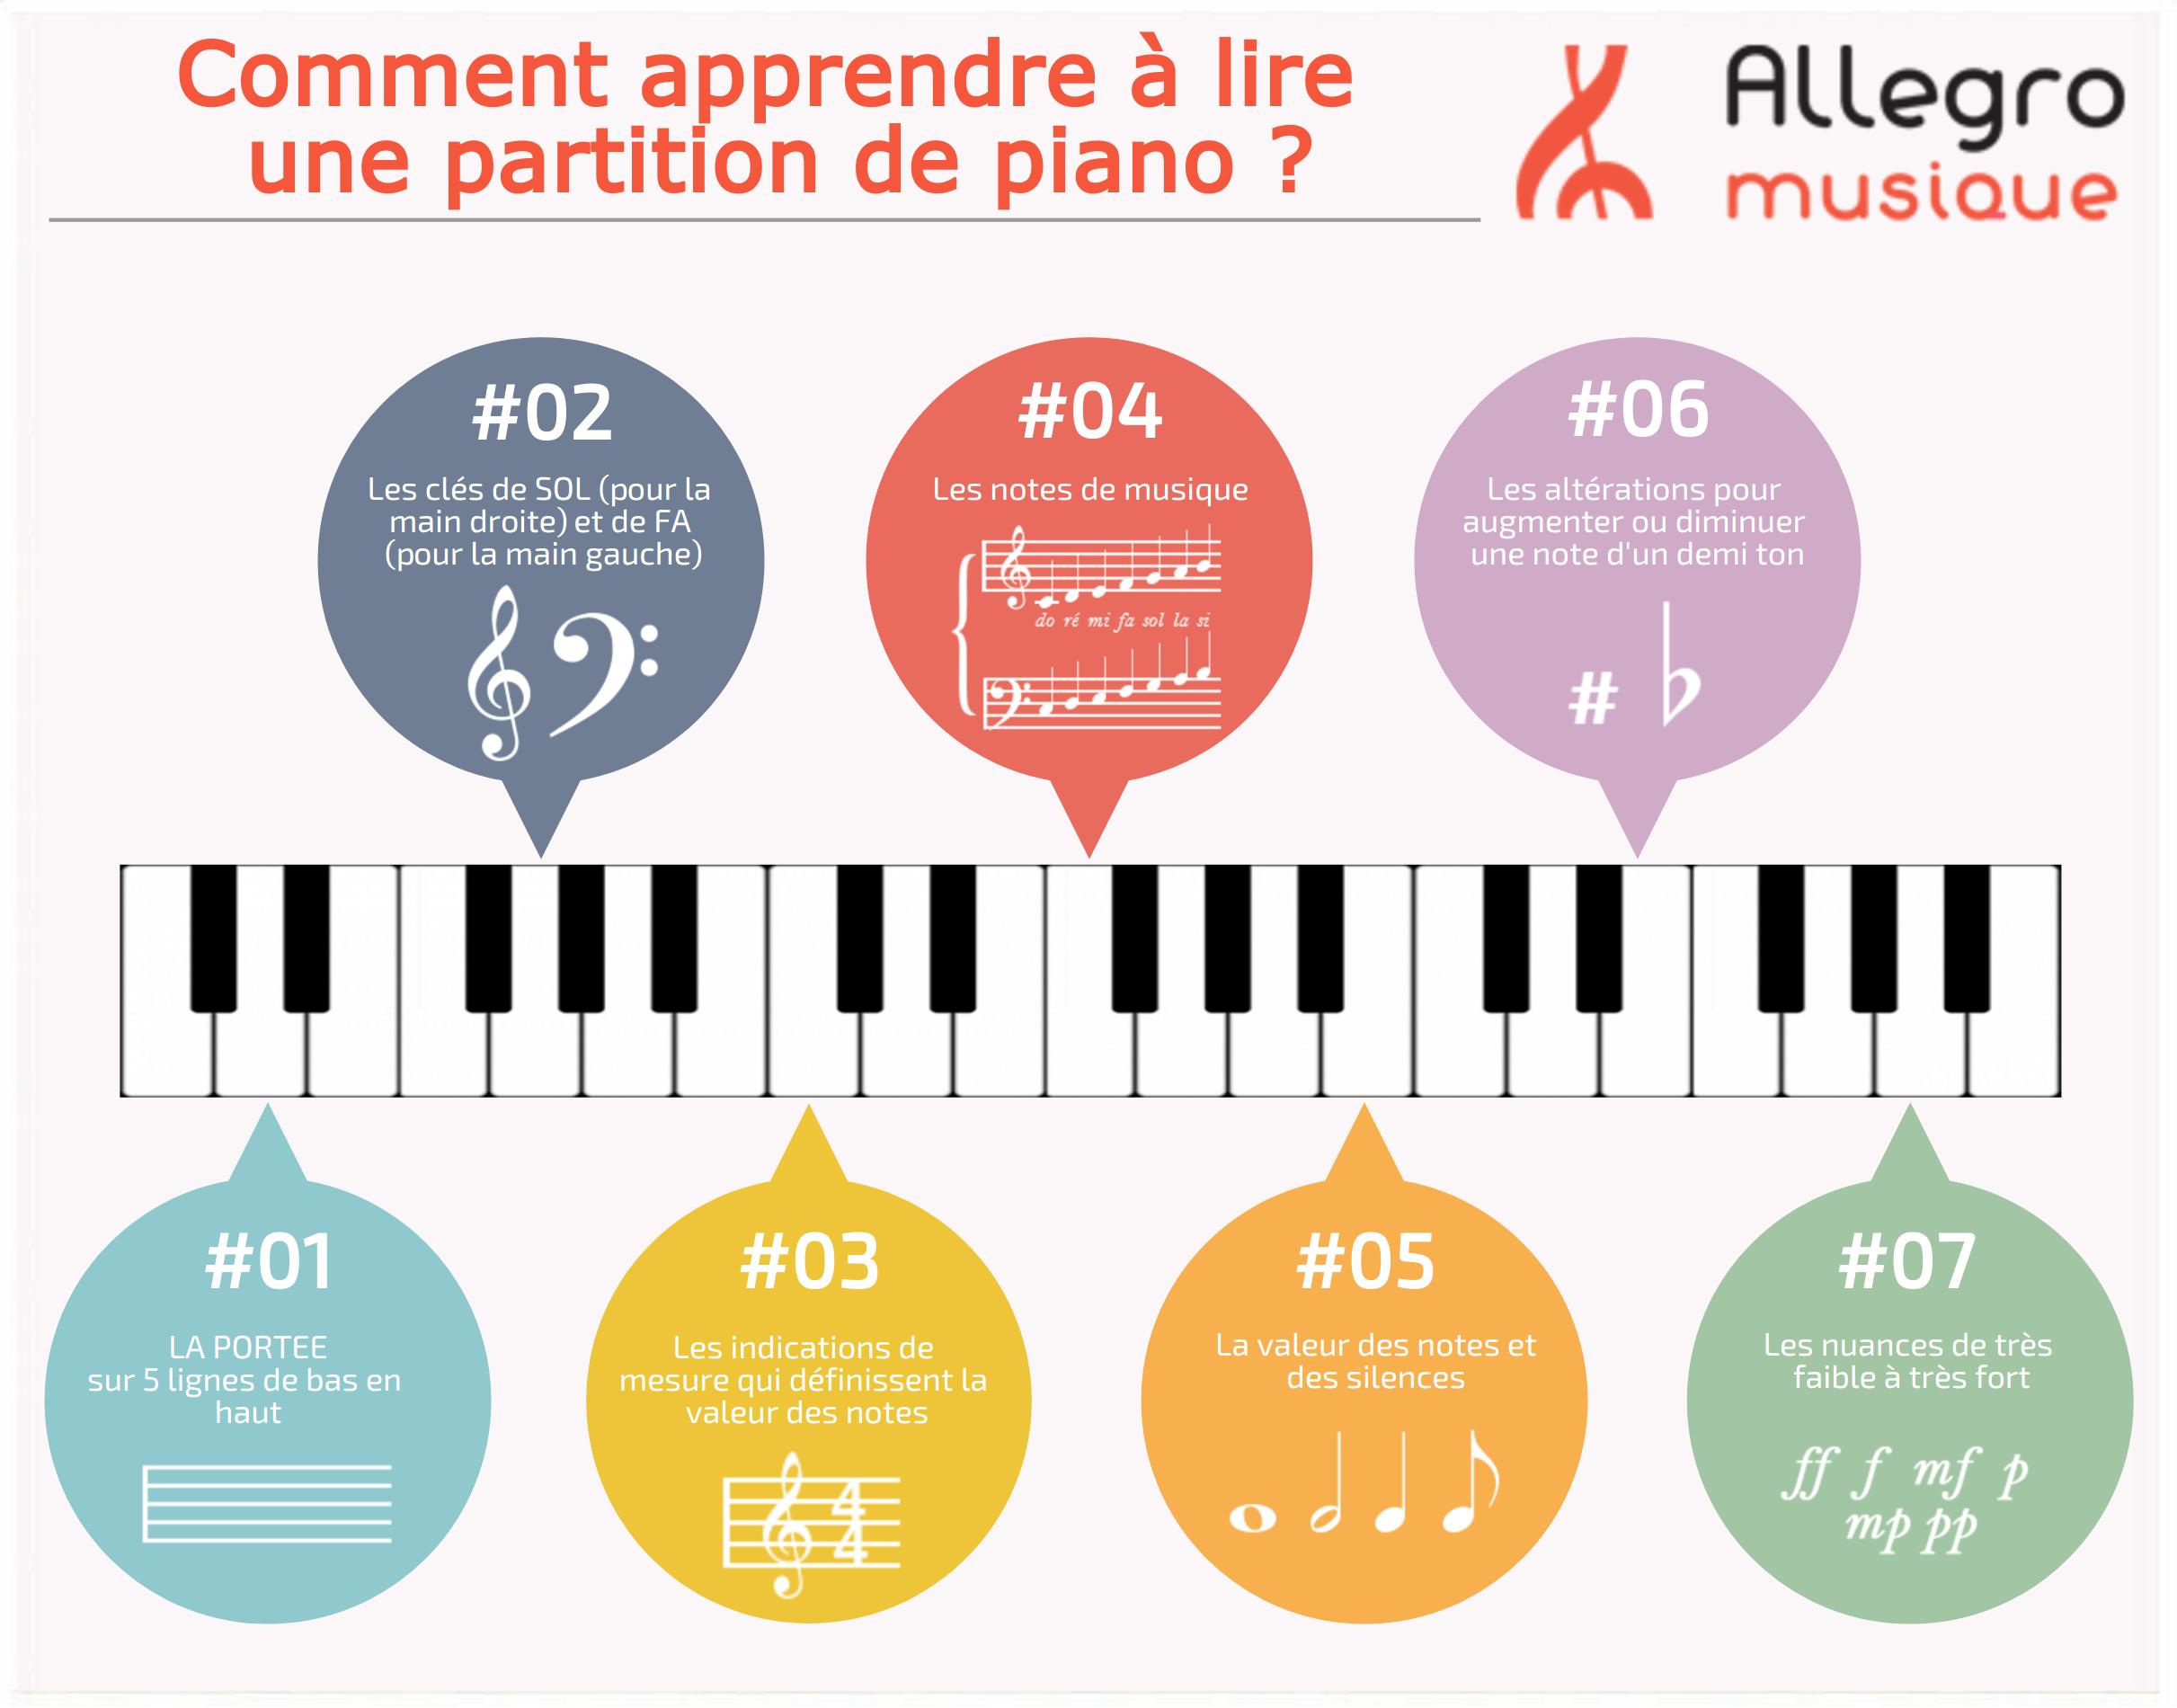 Allegro-lire-partition-piano.png